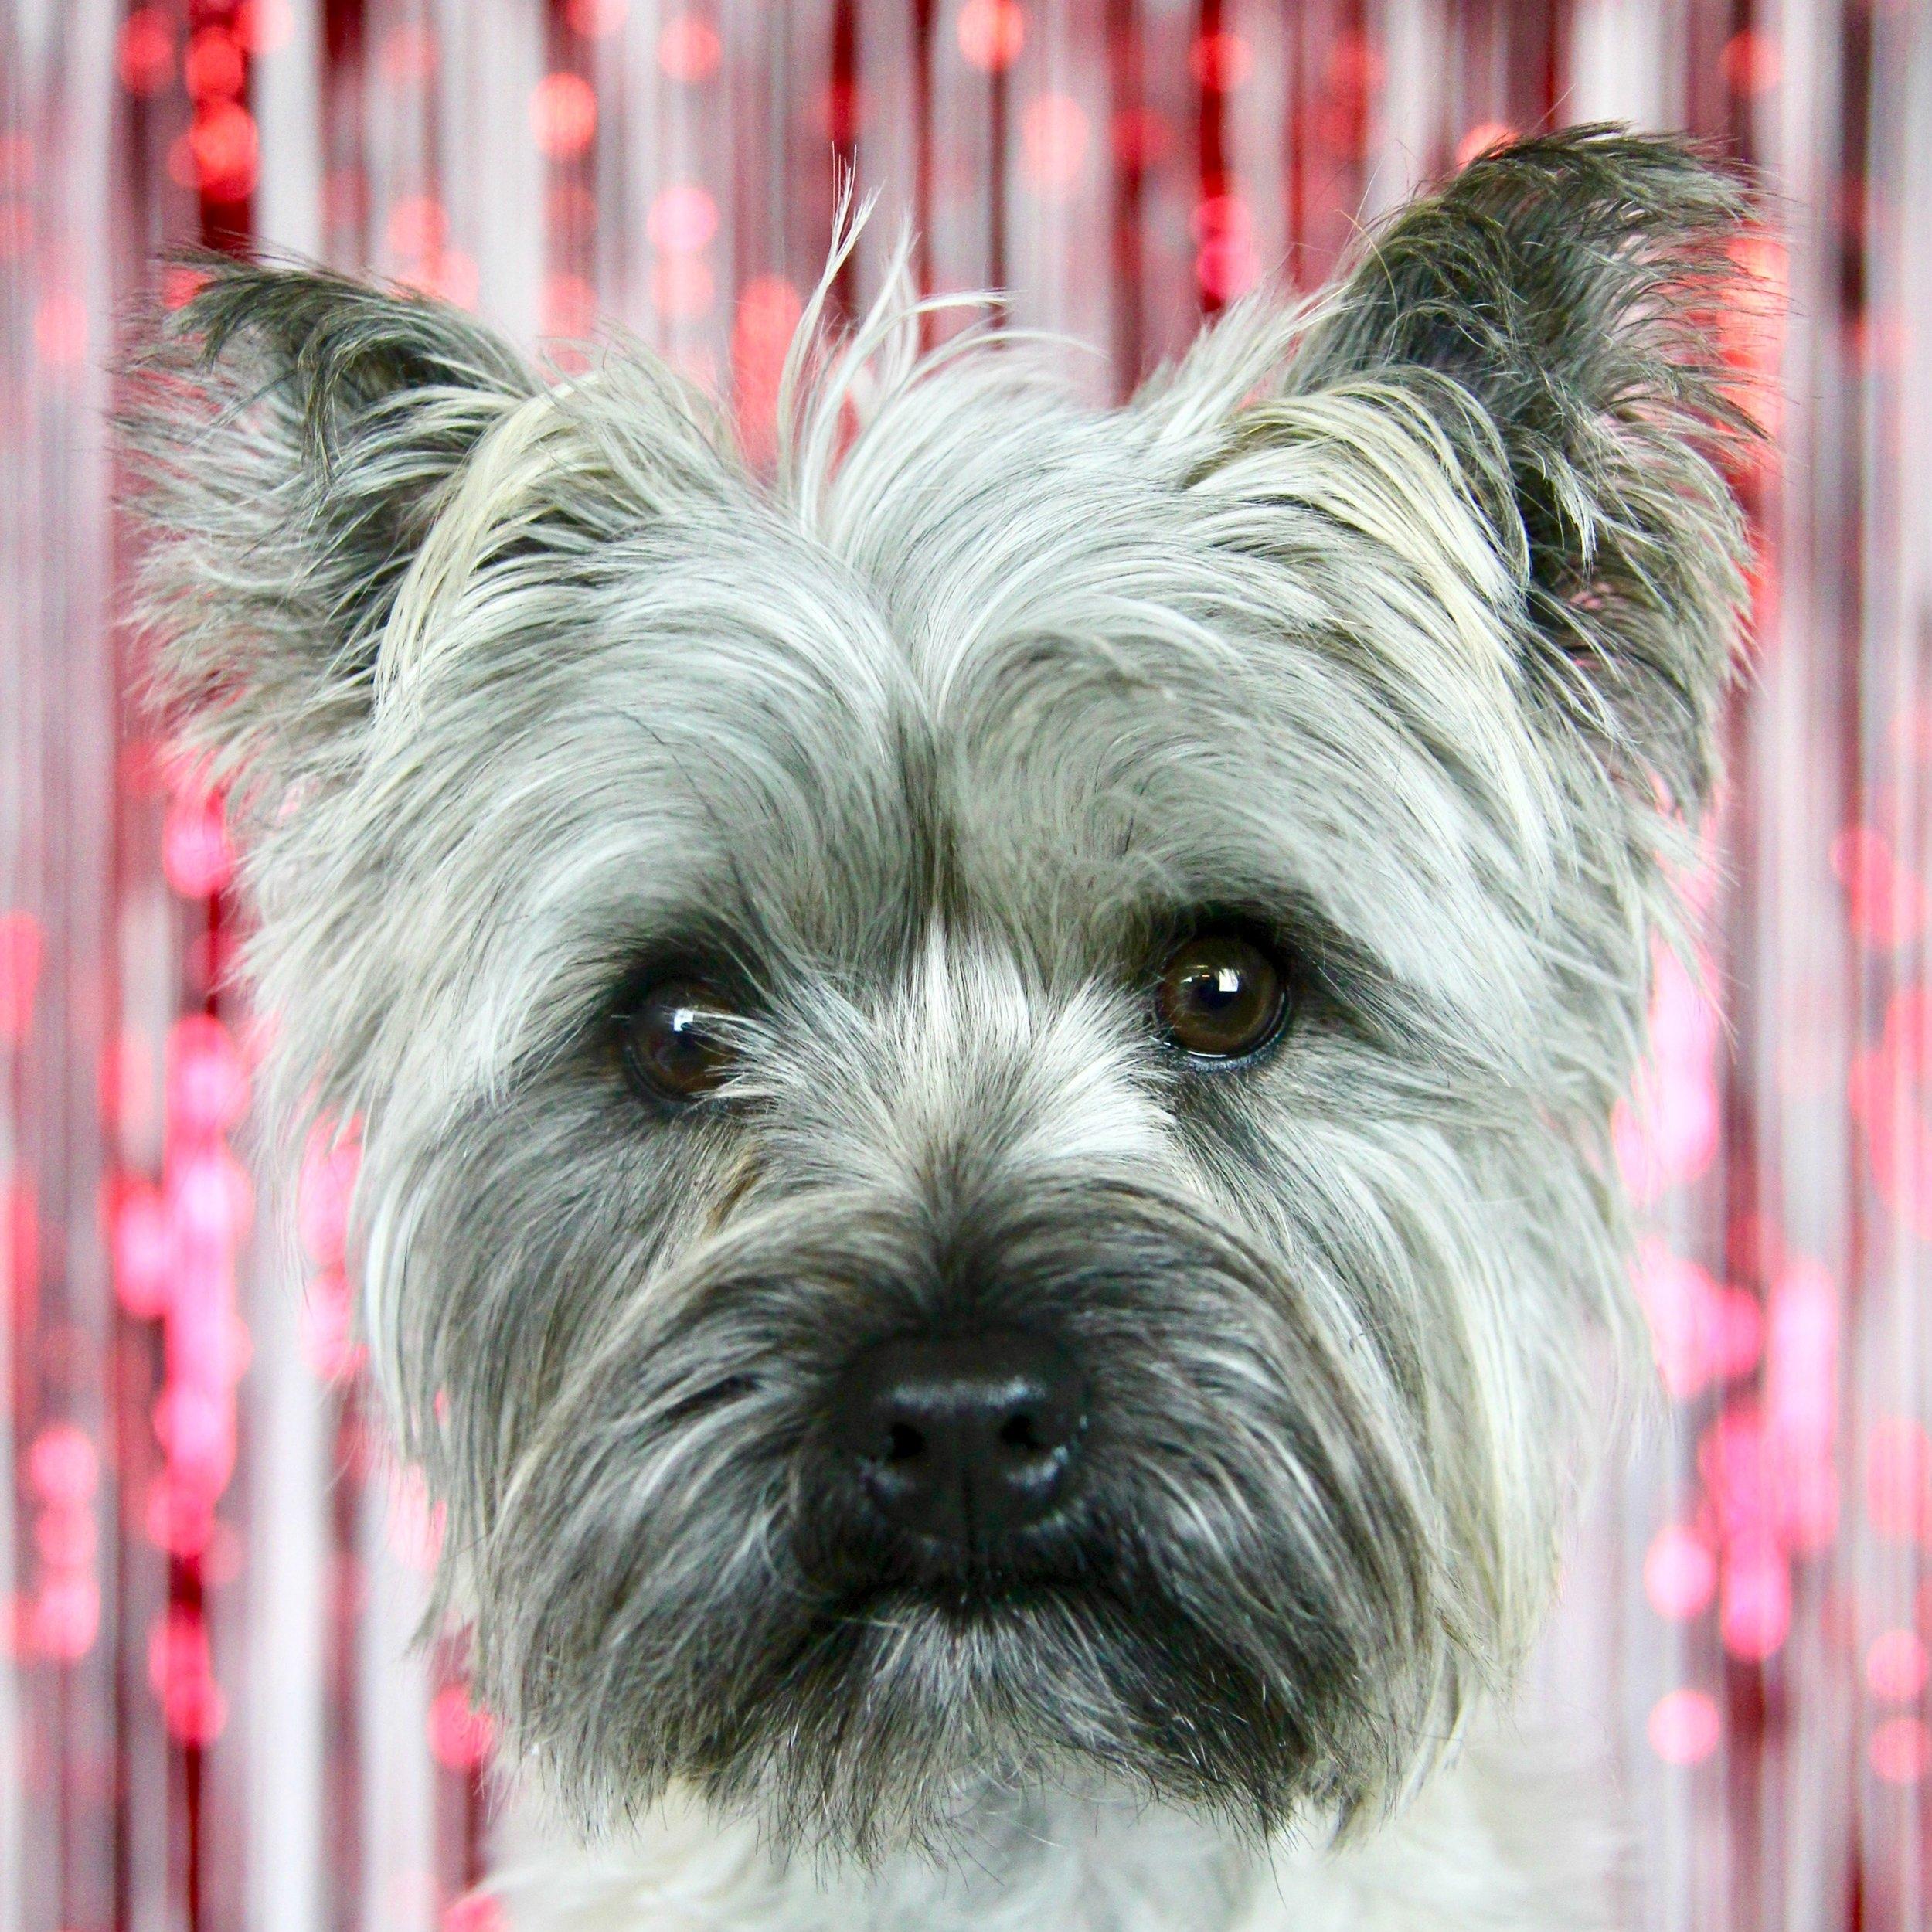 Pepper the Cairn Terrier